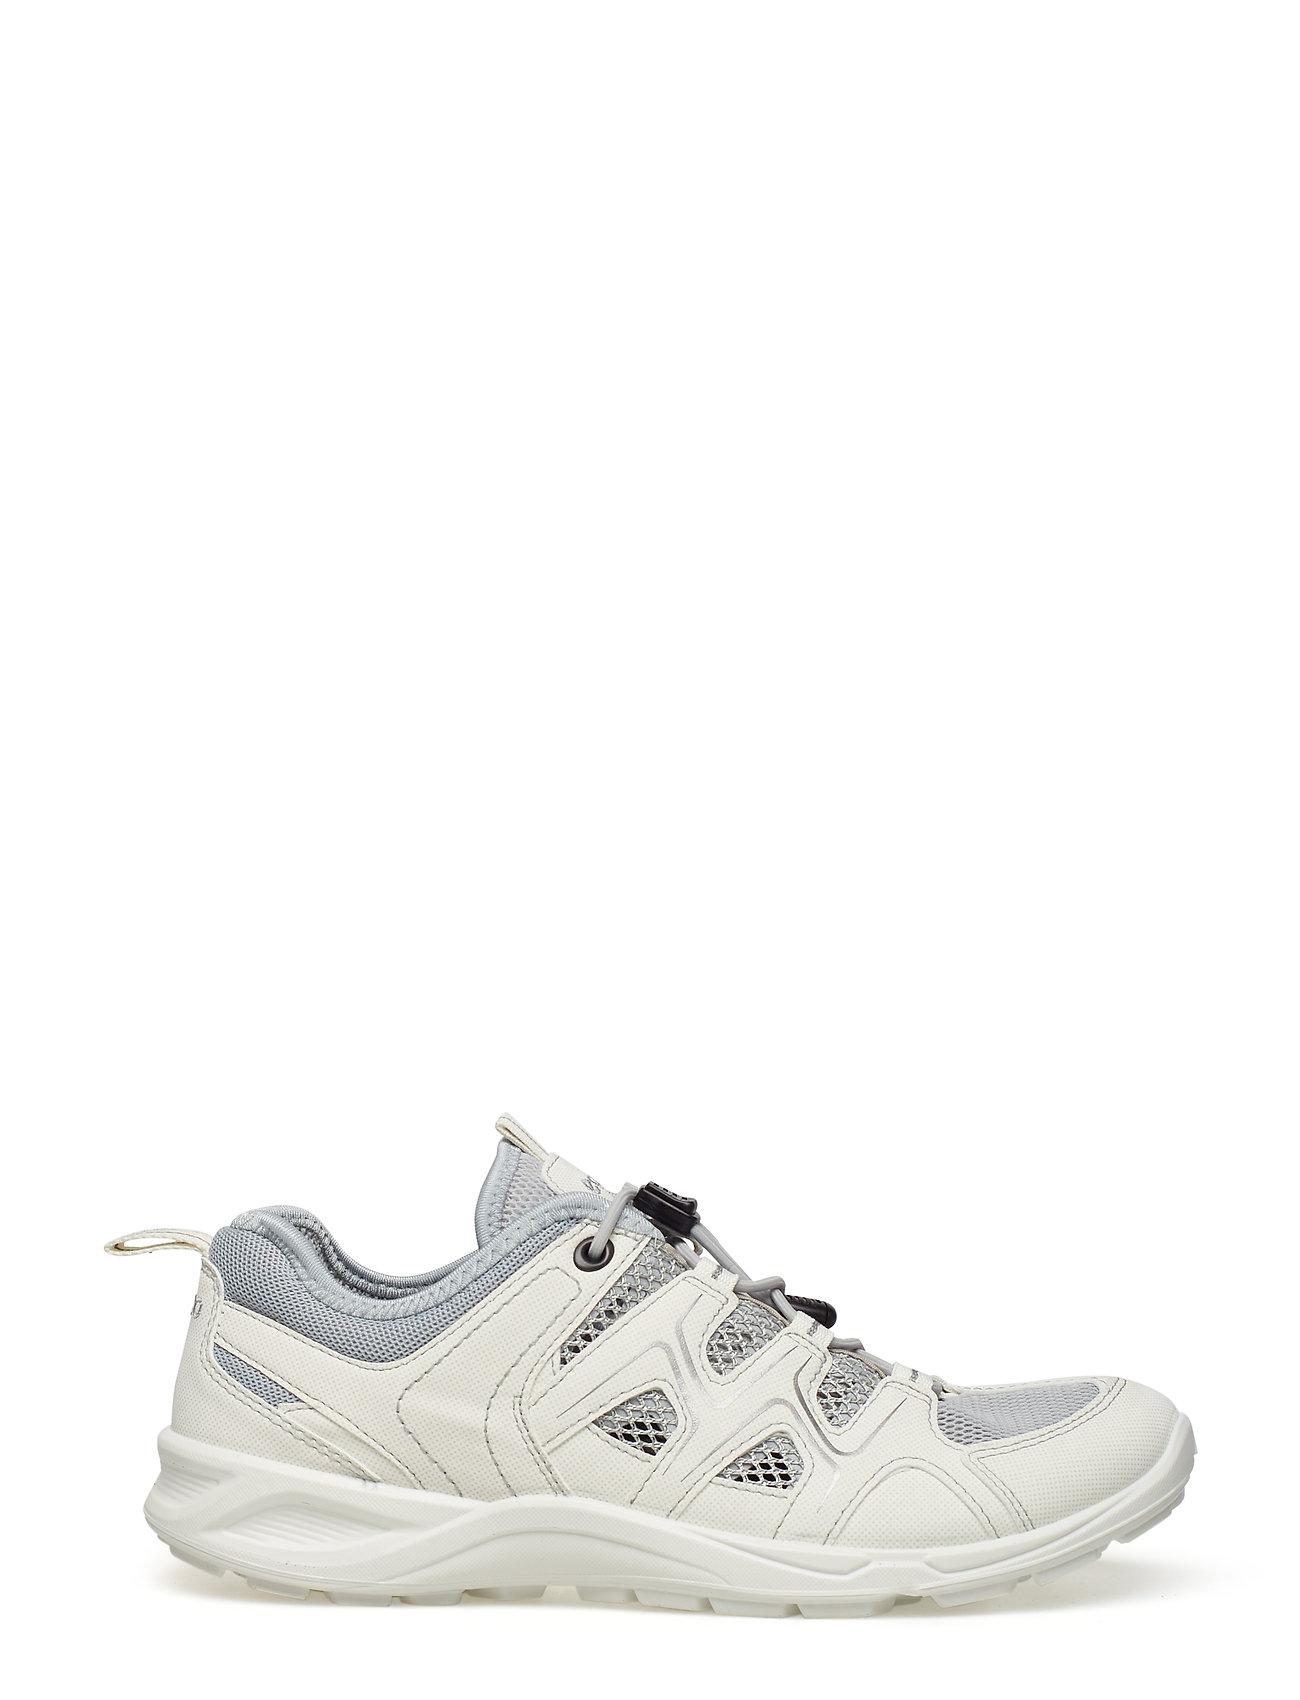 125eb3db857 ECCO sneakers – Terracruise Lt W til dame i Sort - Pashion.dk